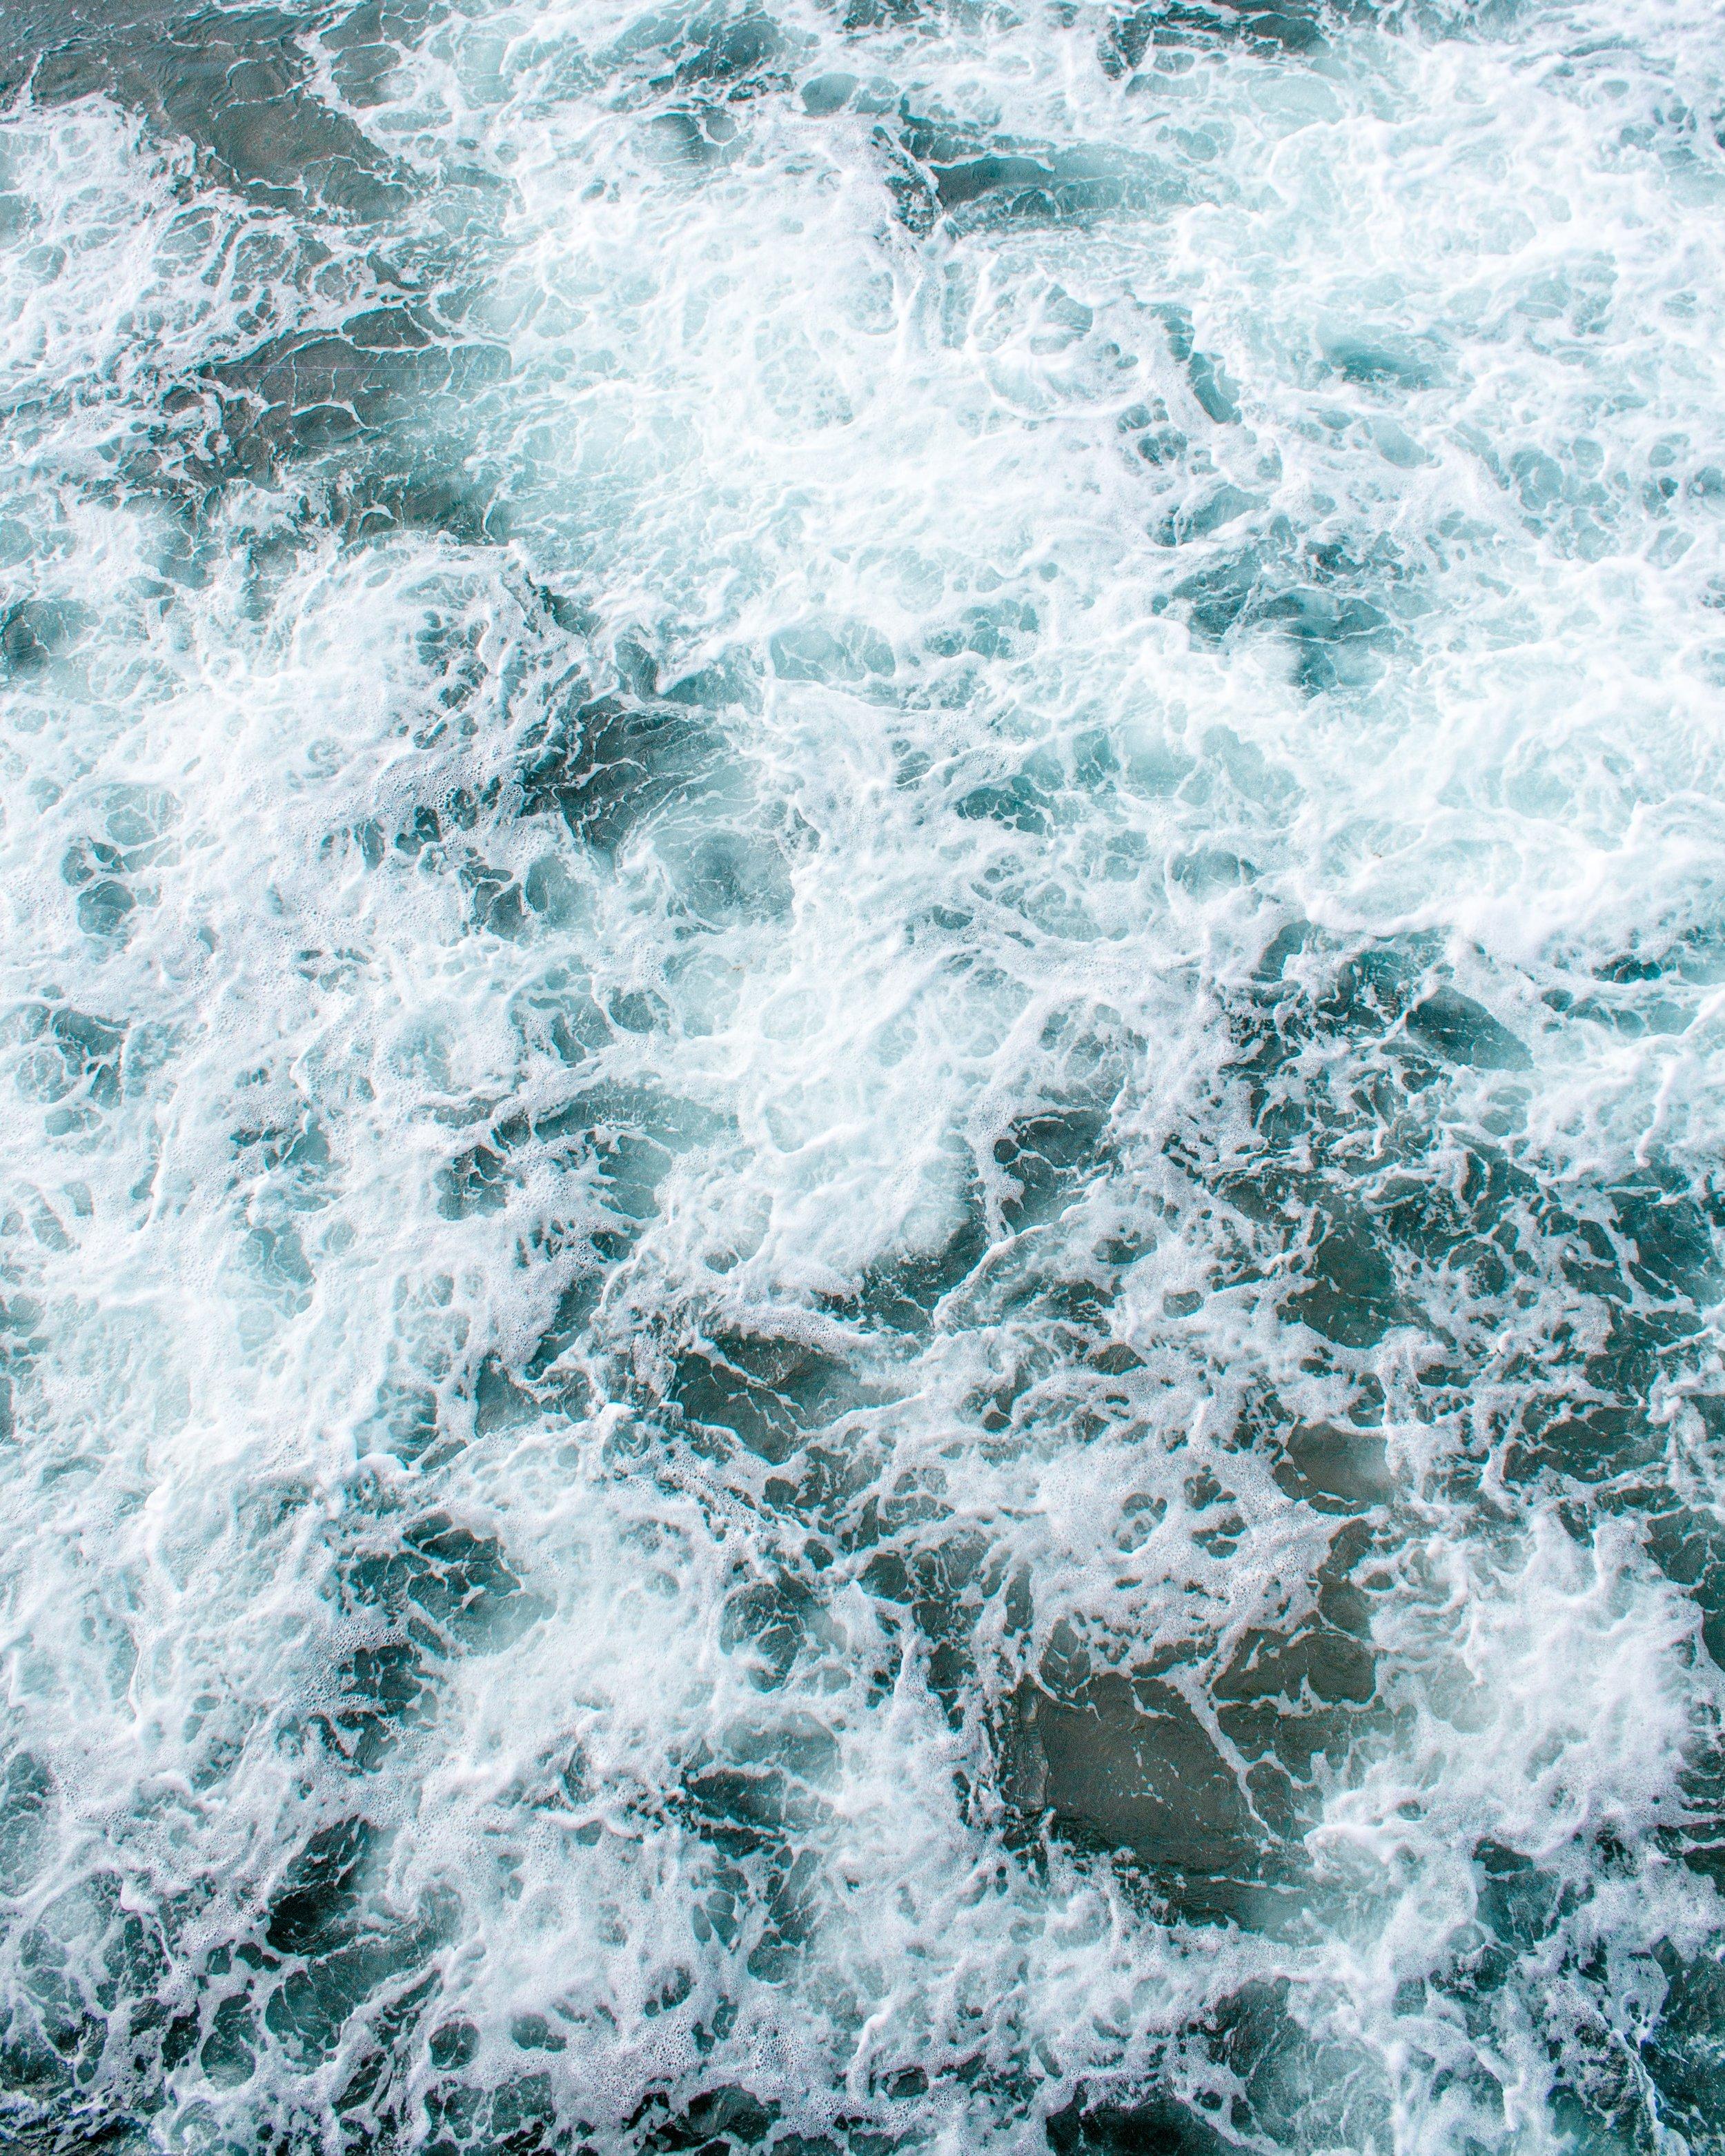 ocean froth -jorge-vasconez-f5sog5ia-rU-unsplash.jpg